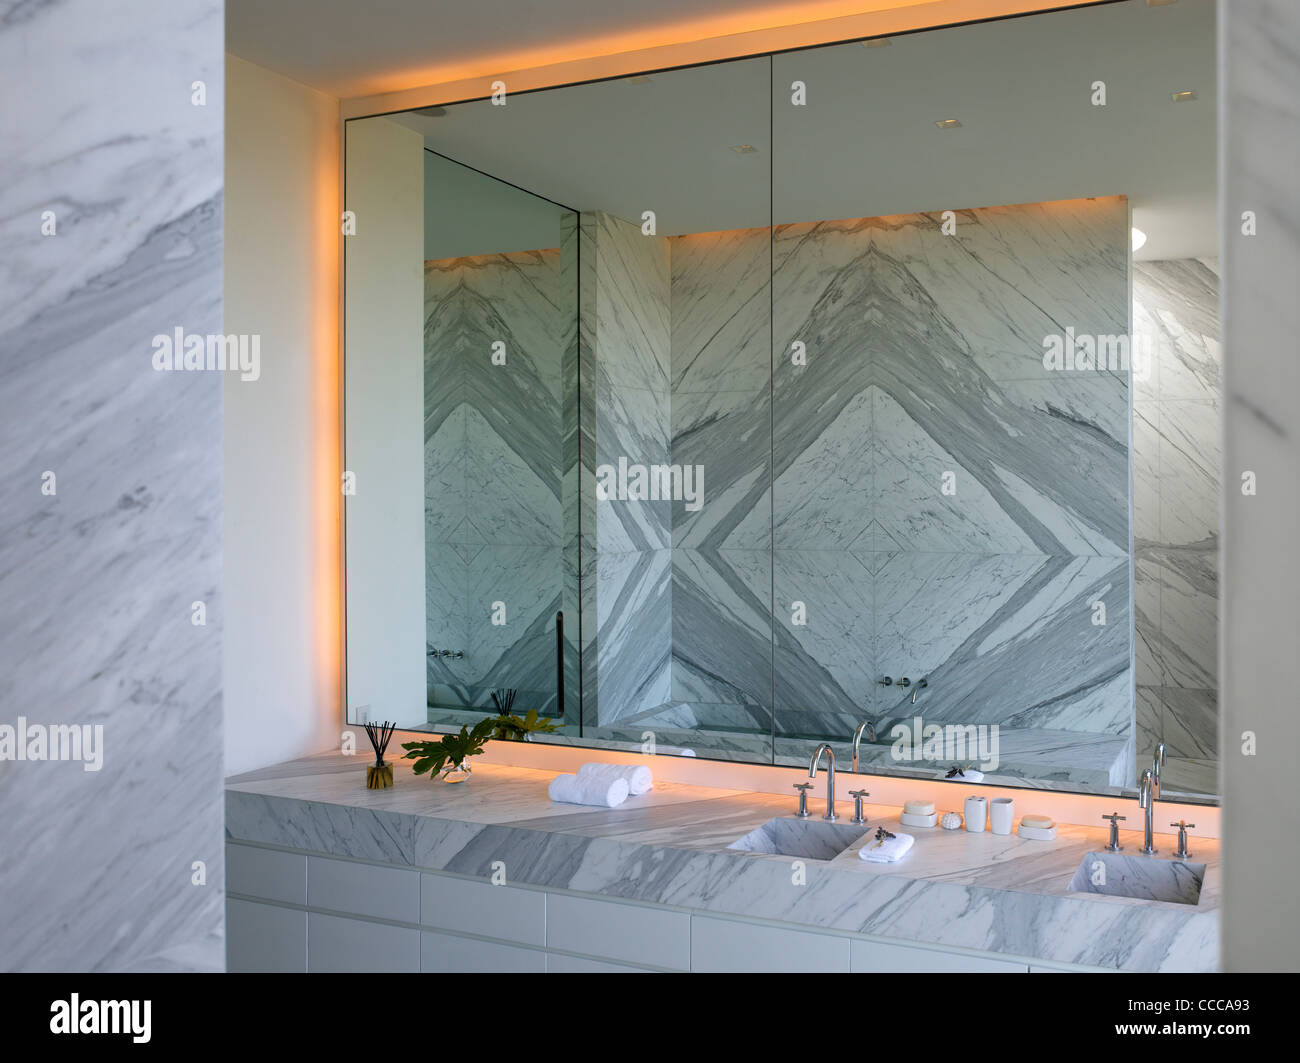 House 10/ Chacra 10, Kallosturin, Villalagos Estate, Punta del Este, Uruguay, 2011, master bathroom mirror - Stock Image